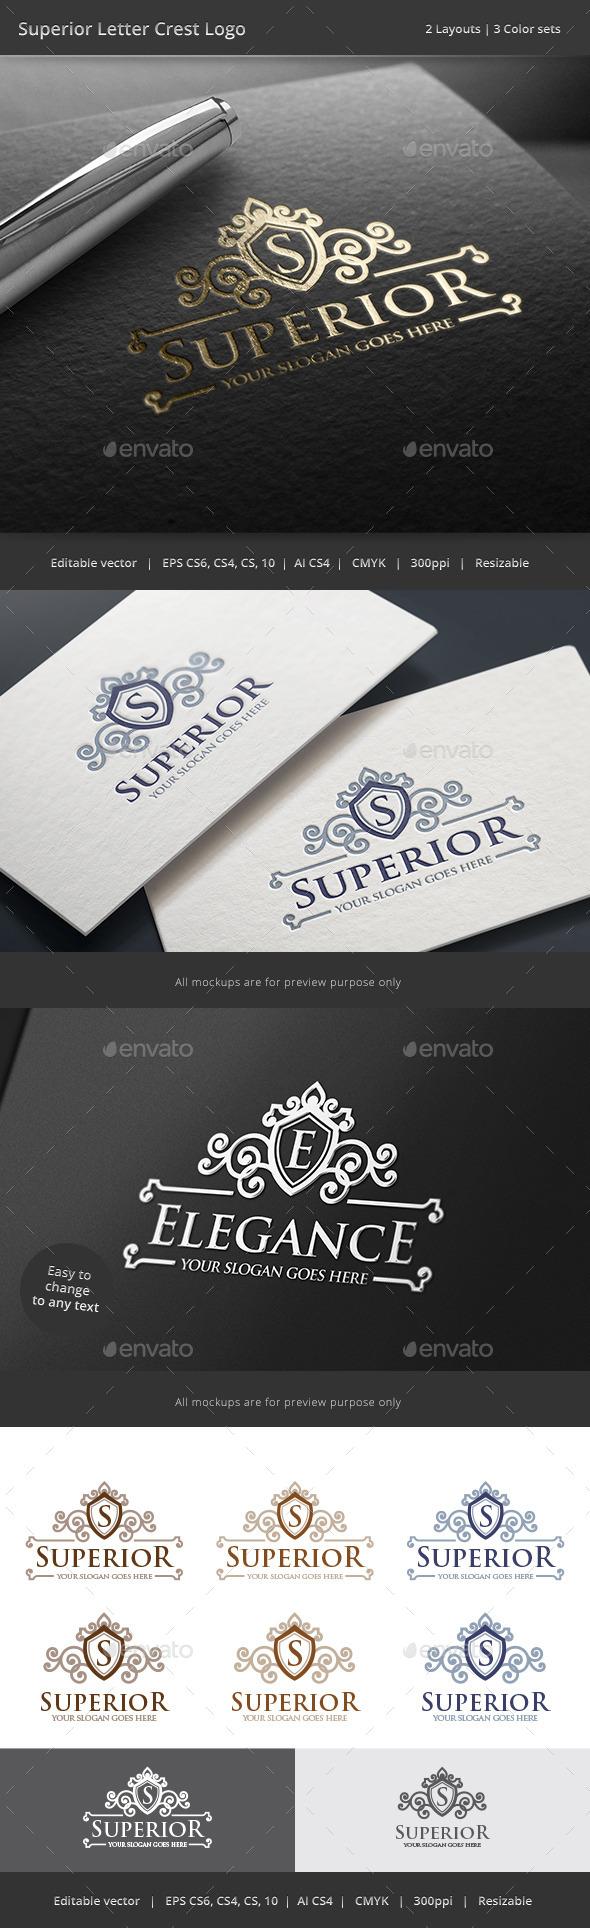 GraphicRiver Superior Letter Crest Logo 8825023